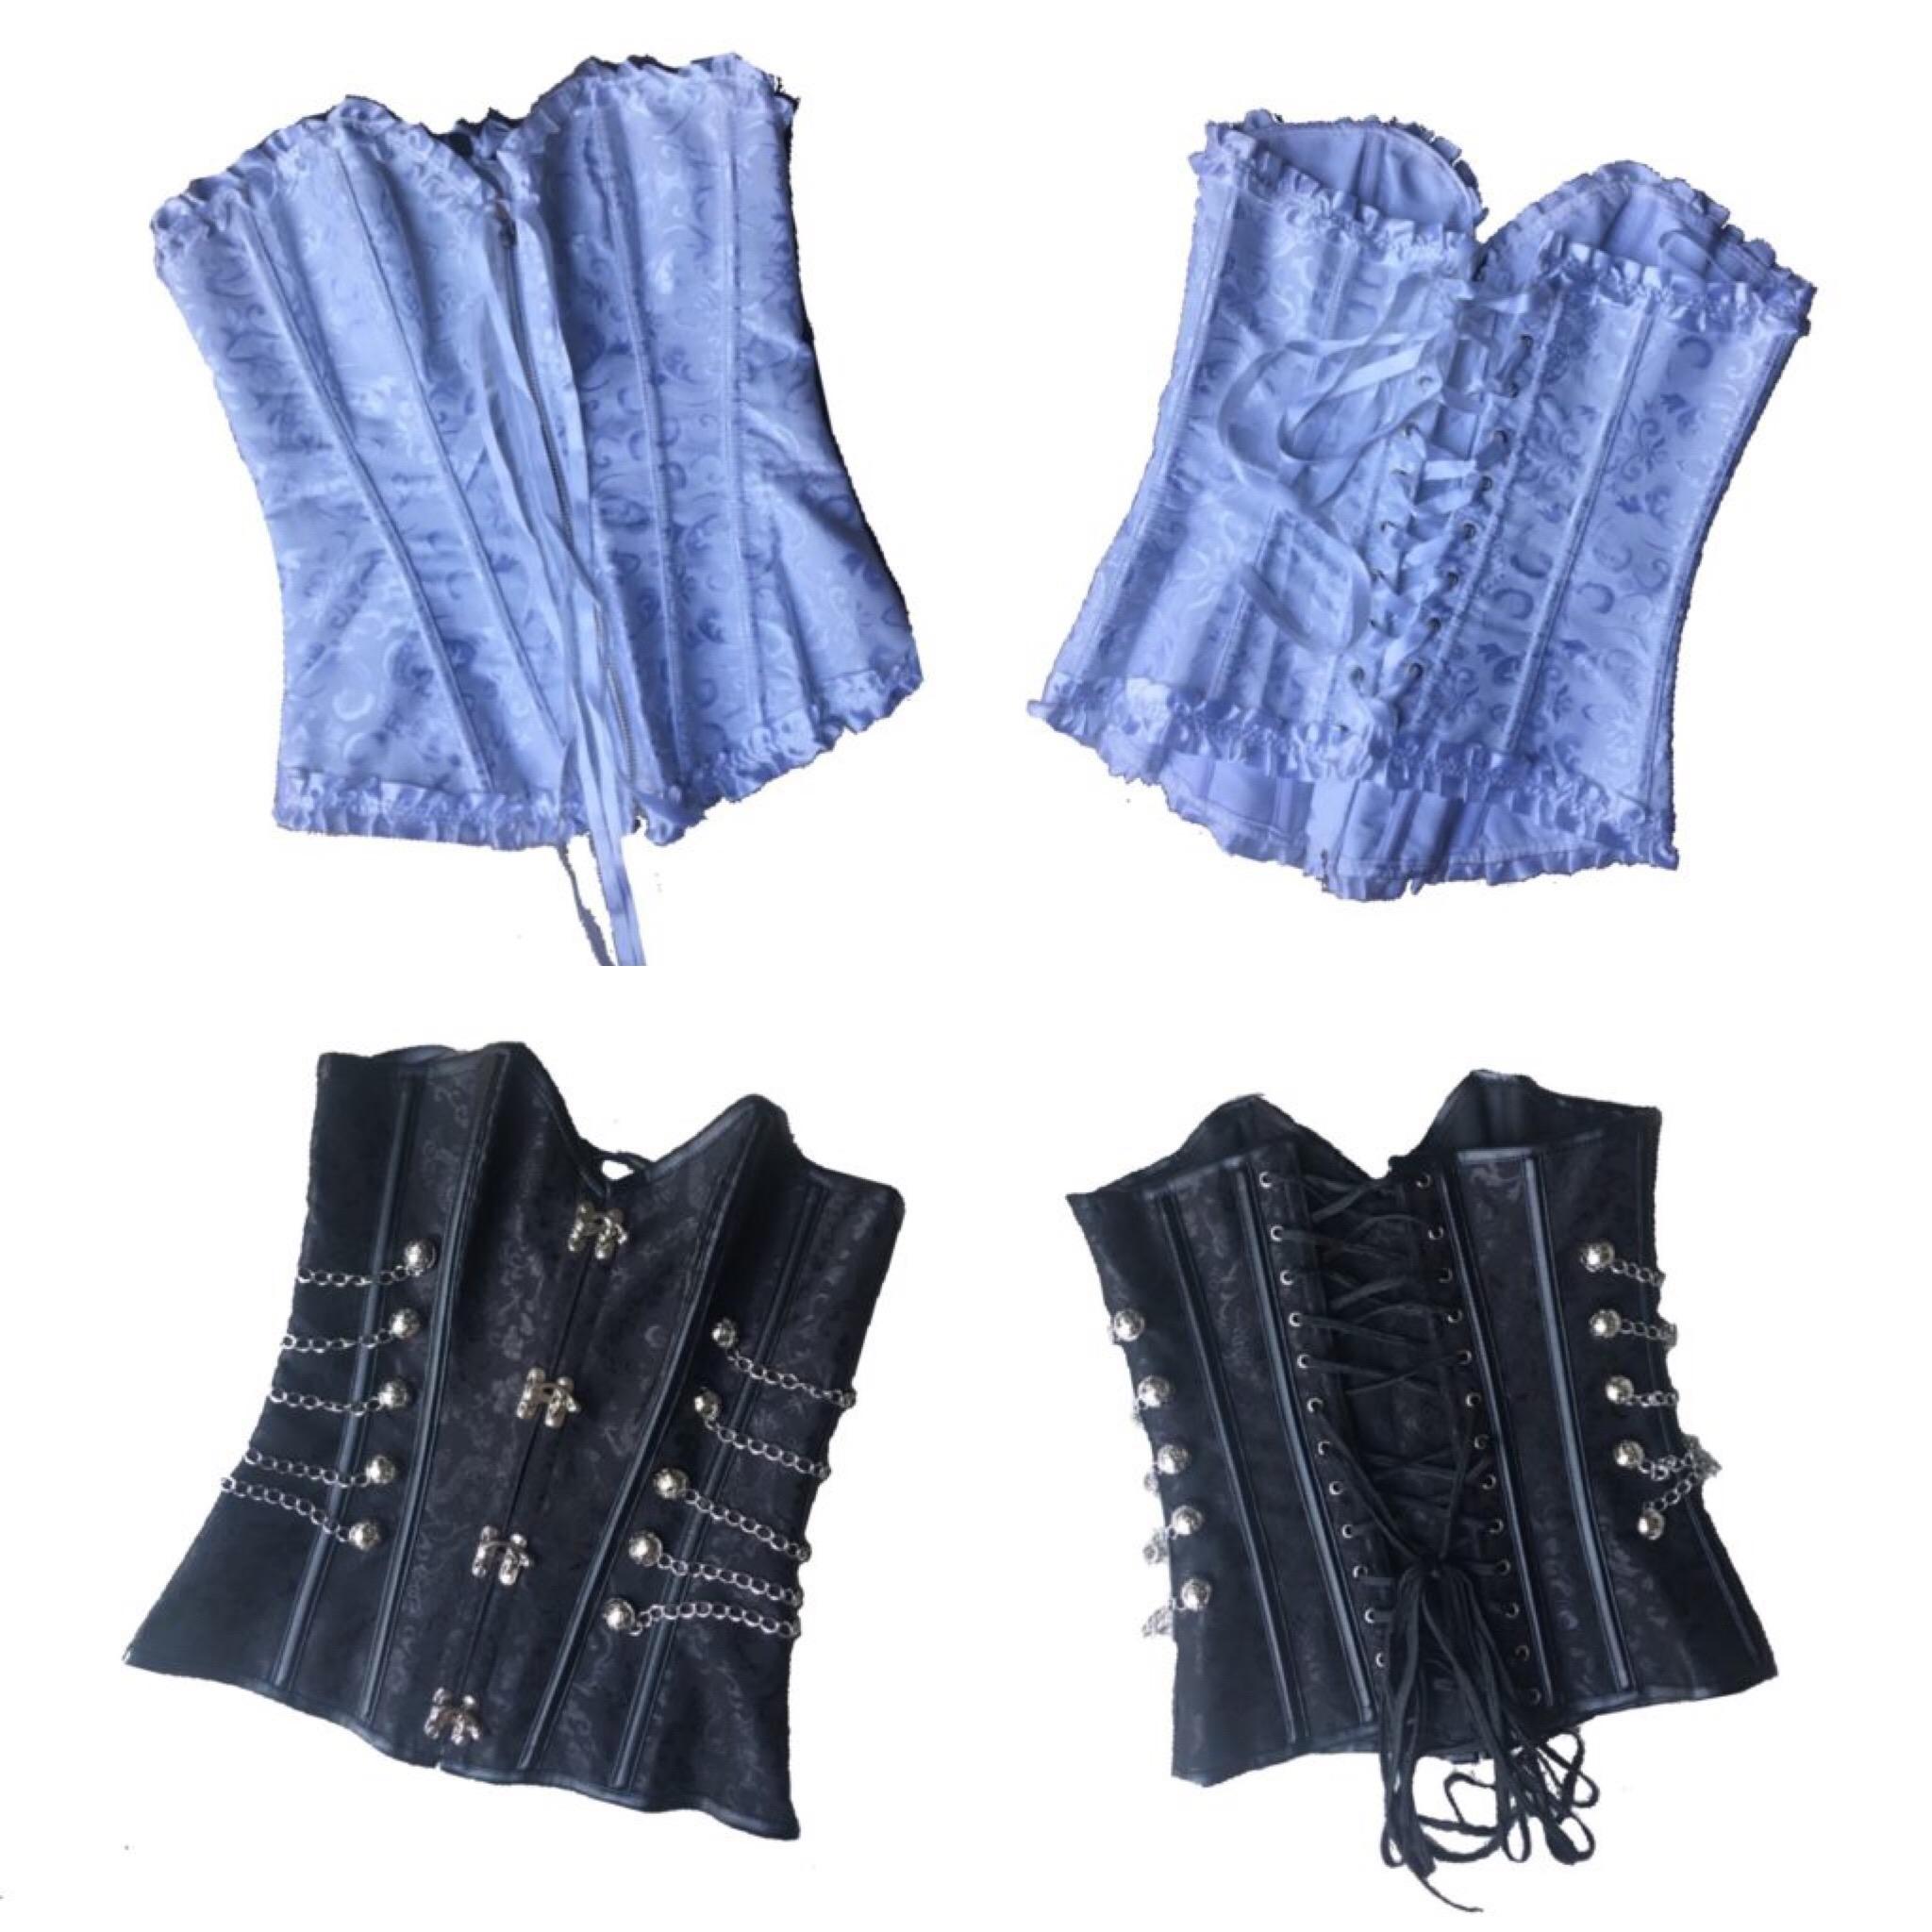 Black and white corset